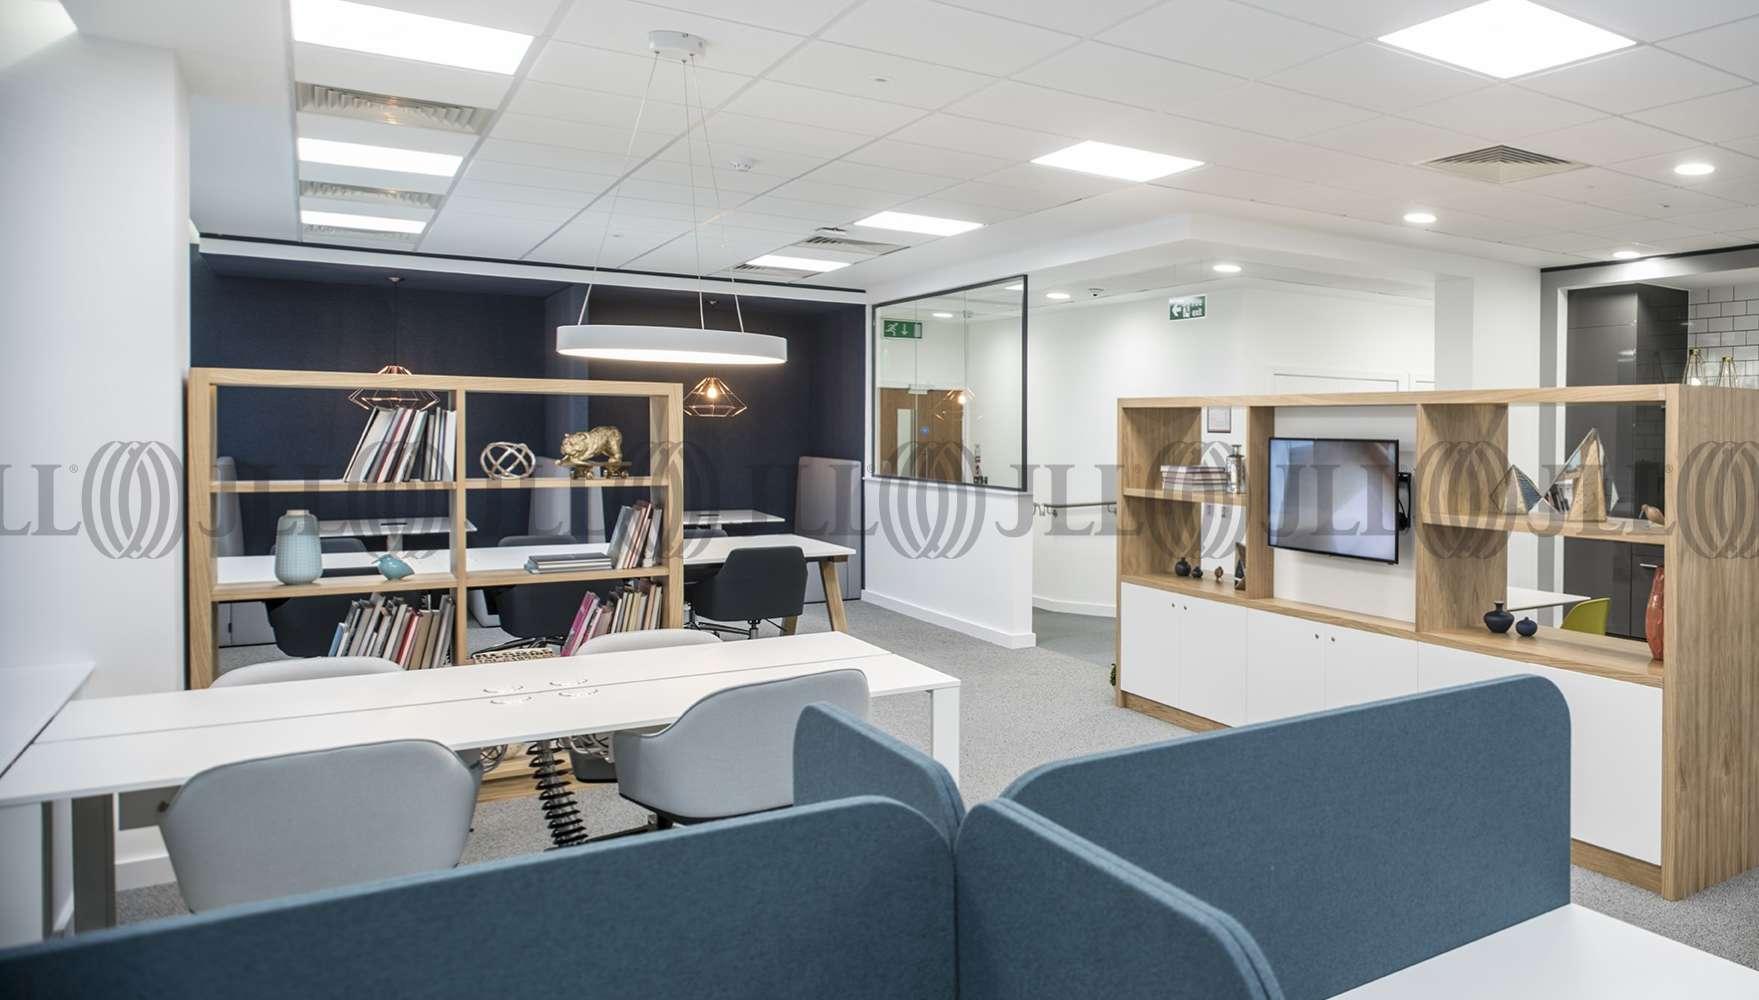 Coworking / flex office Mönchengladbach, 41061 -  Mönchengladbach - C0104